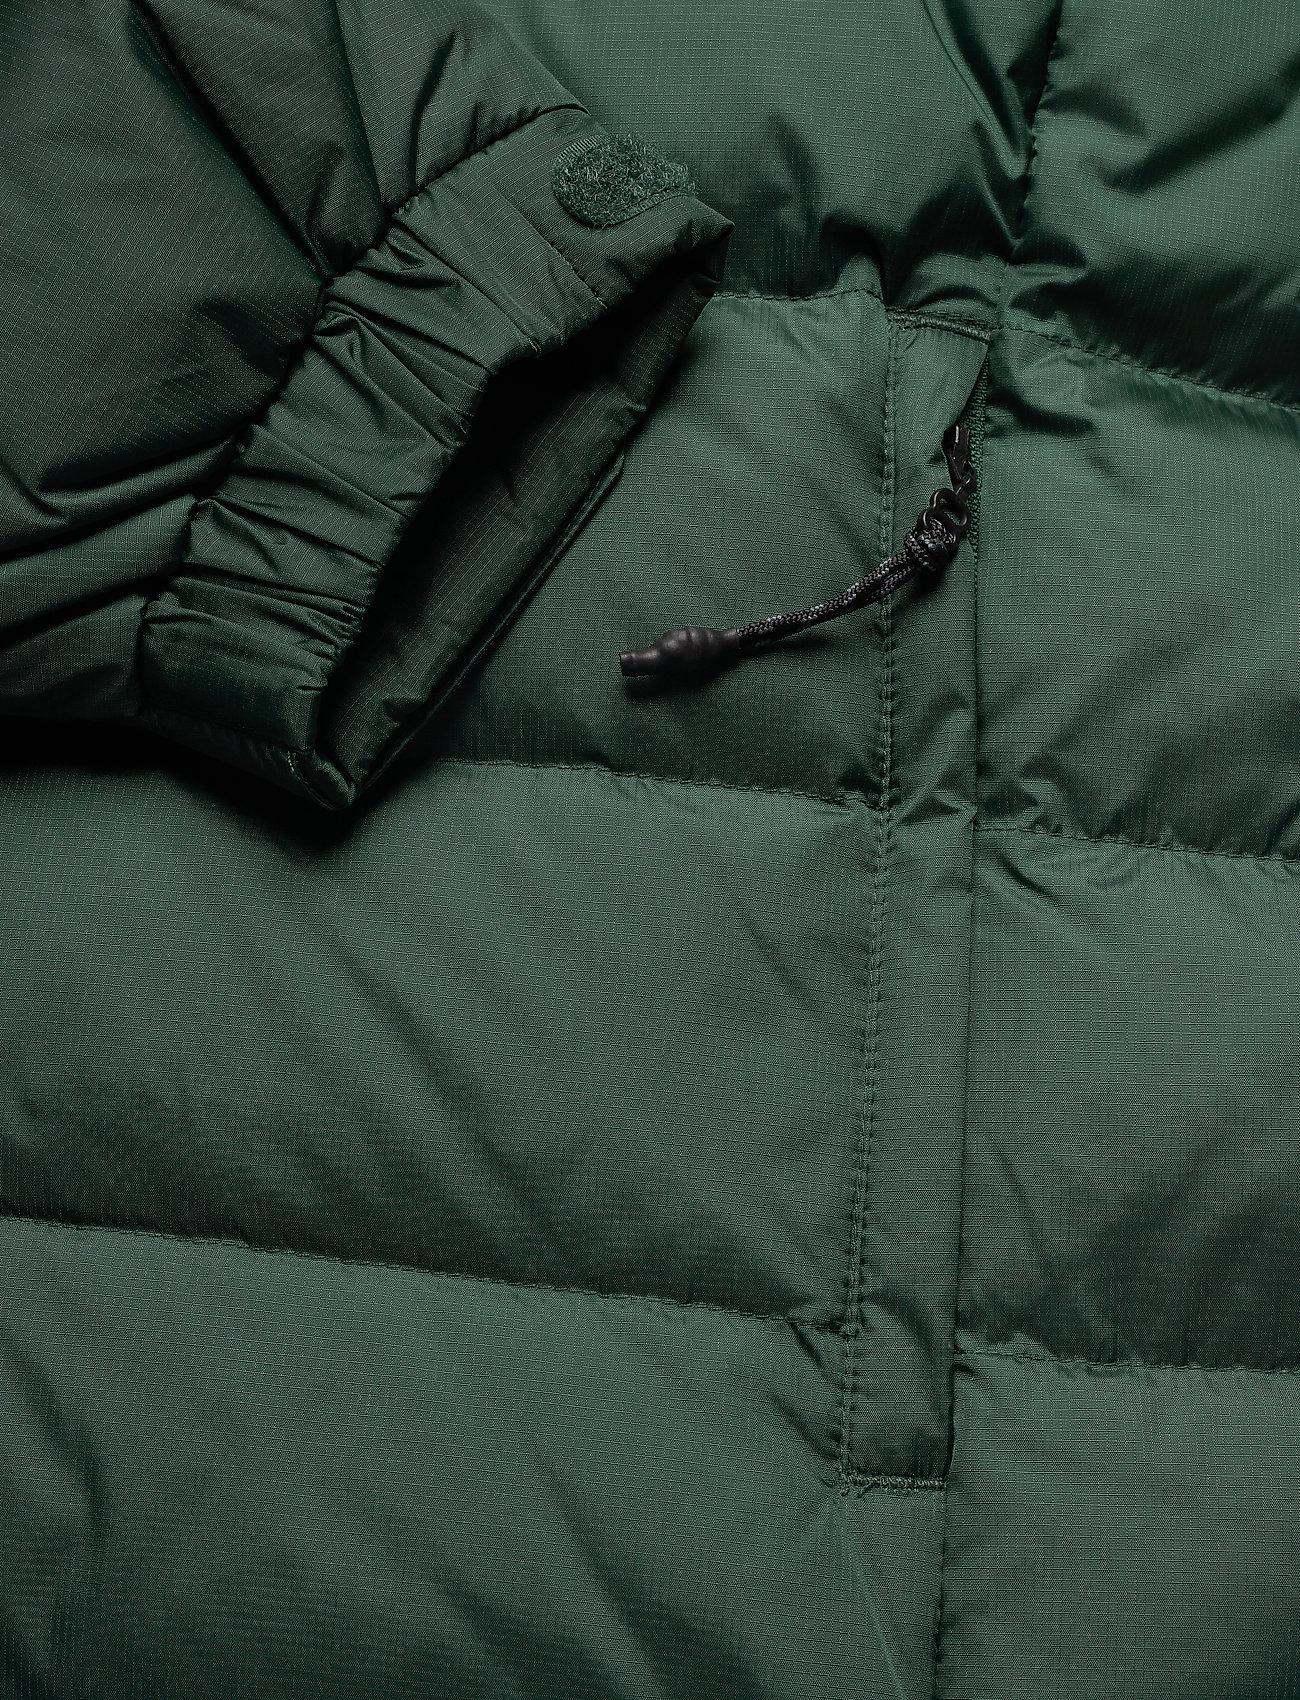 8848 Altitude Edzo Down Jacket - Jackor & Rockar Goodwood Green